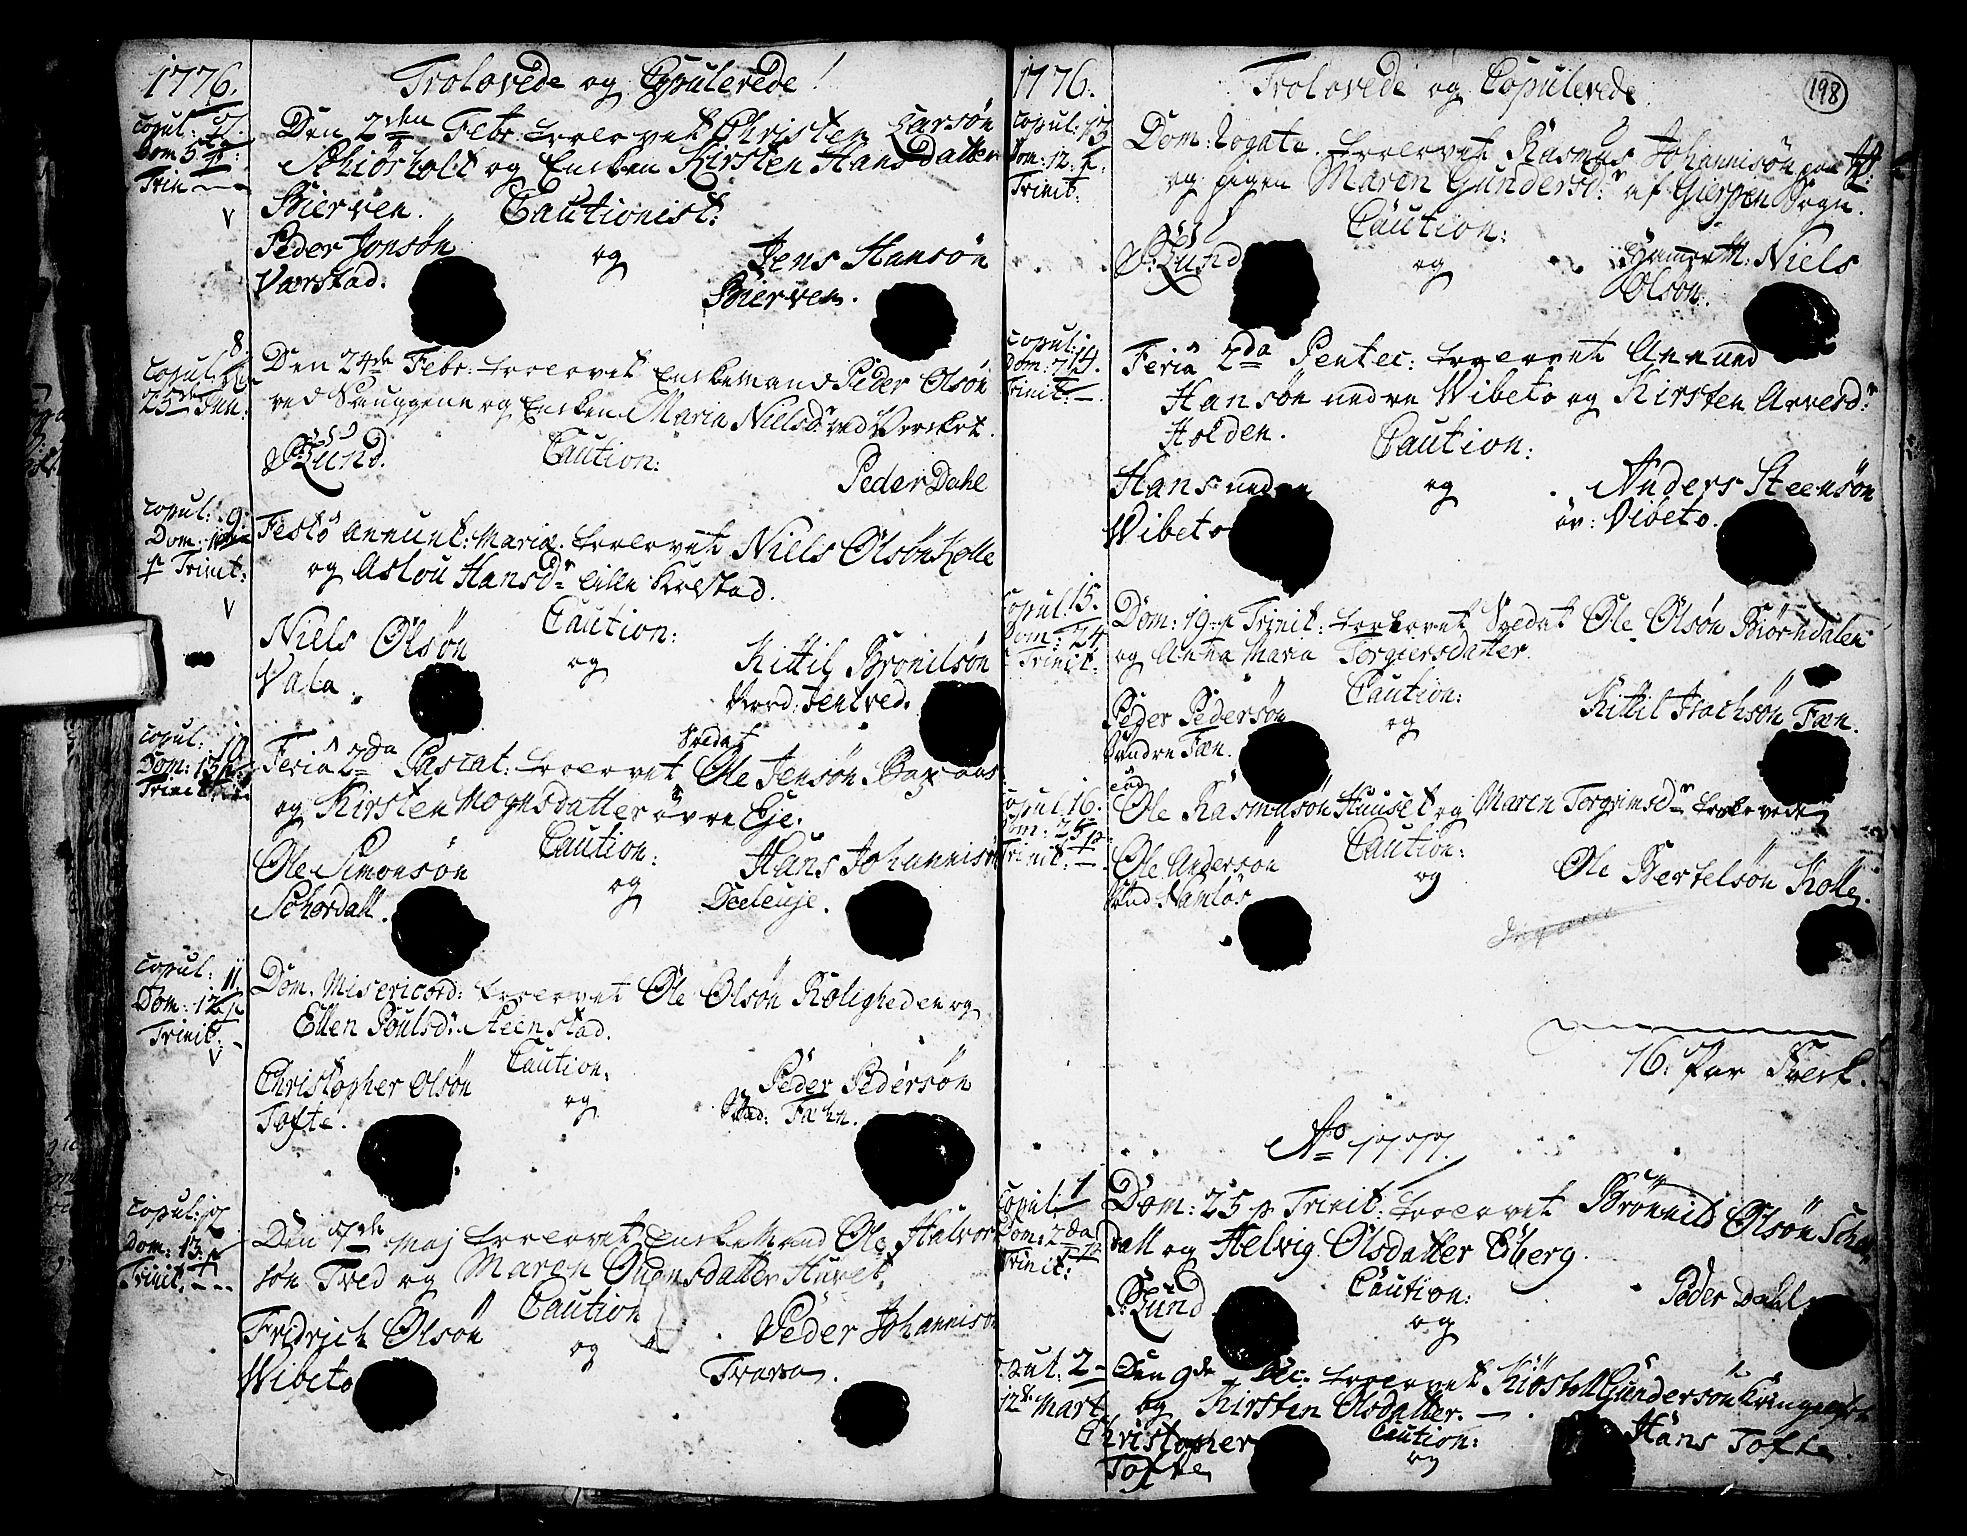 SAKO, Holla kirkebøker, F/Fa/L0001: Parish register (official) no. 1, 1717-1779, p. 198